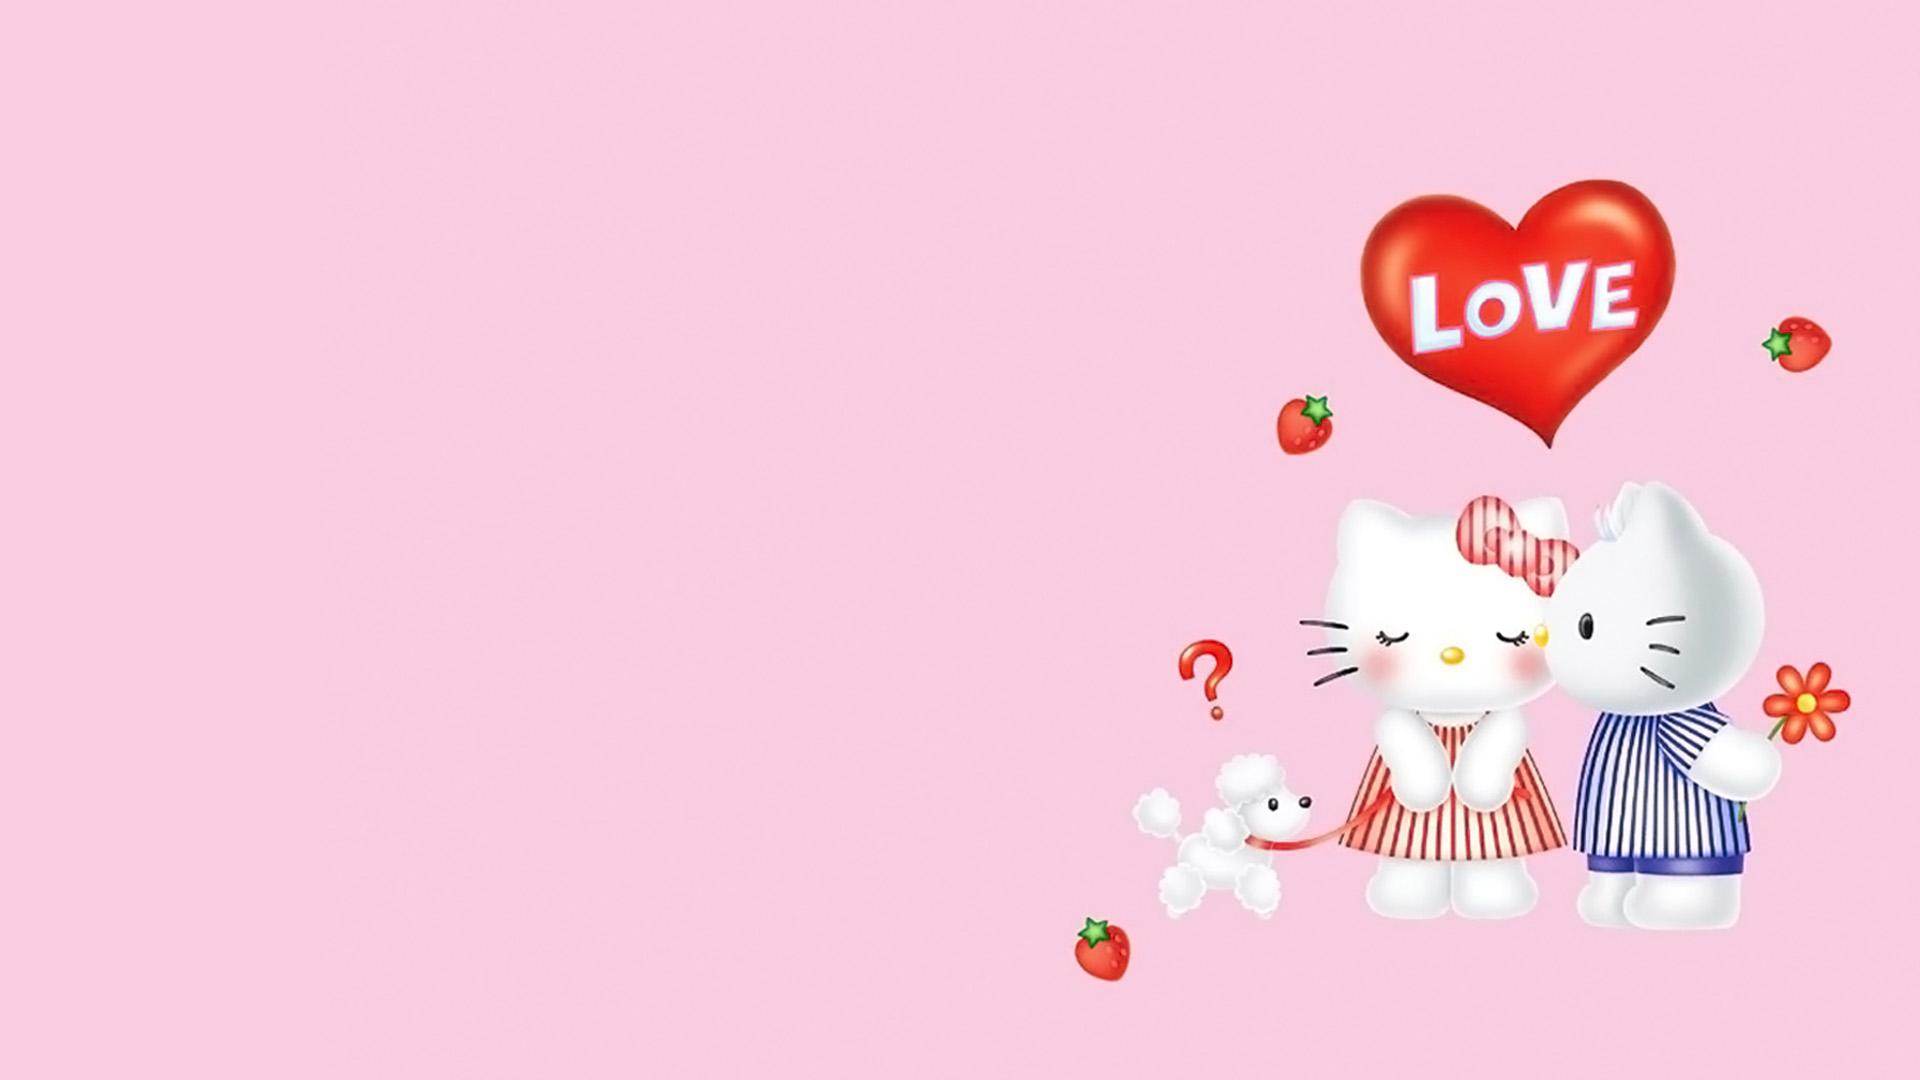 Cute Hello Kitty Wallpaper Wallpapers Cartoons Imagesci 1920x1080